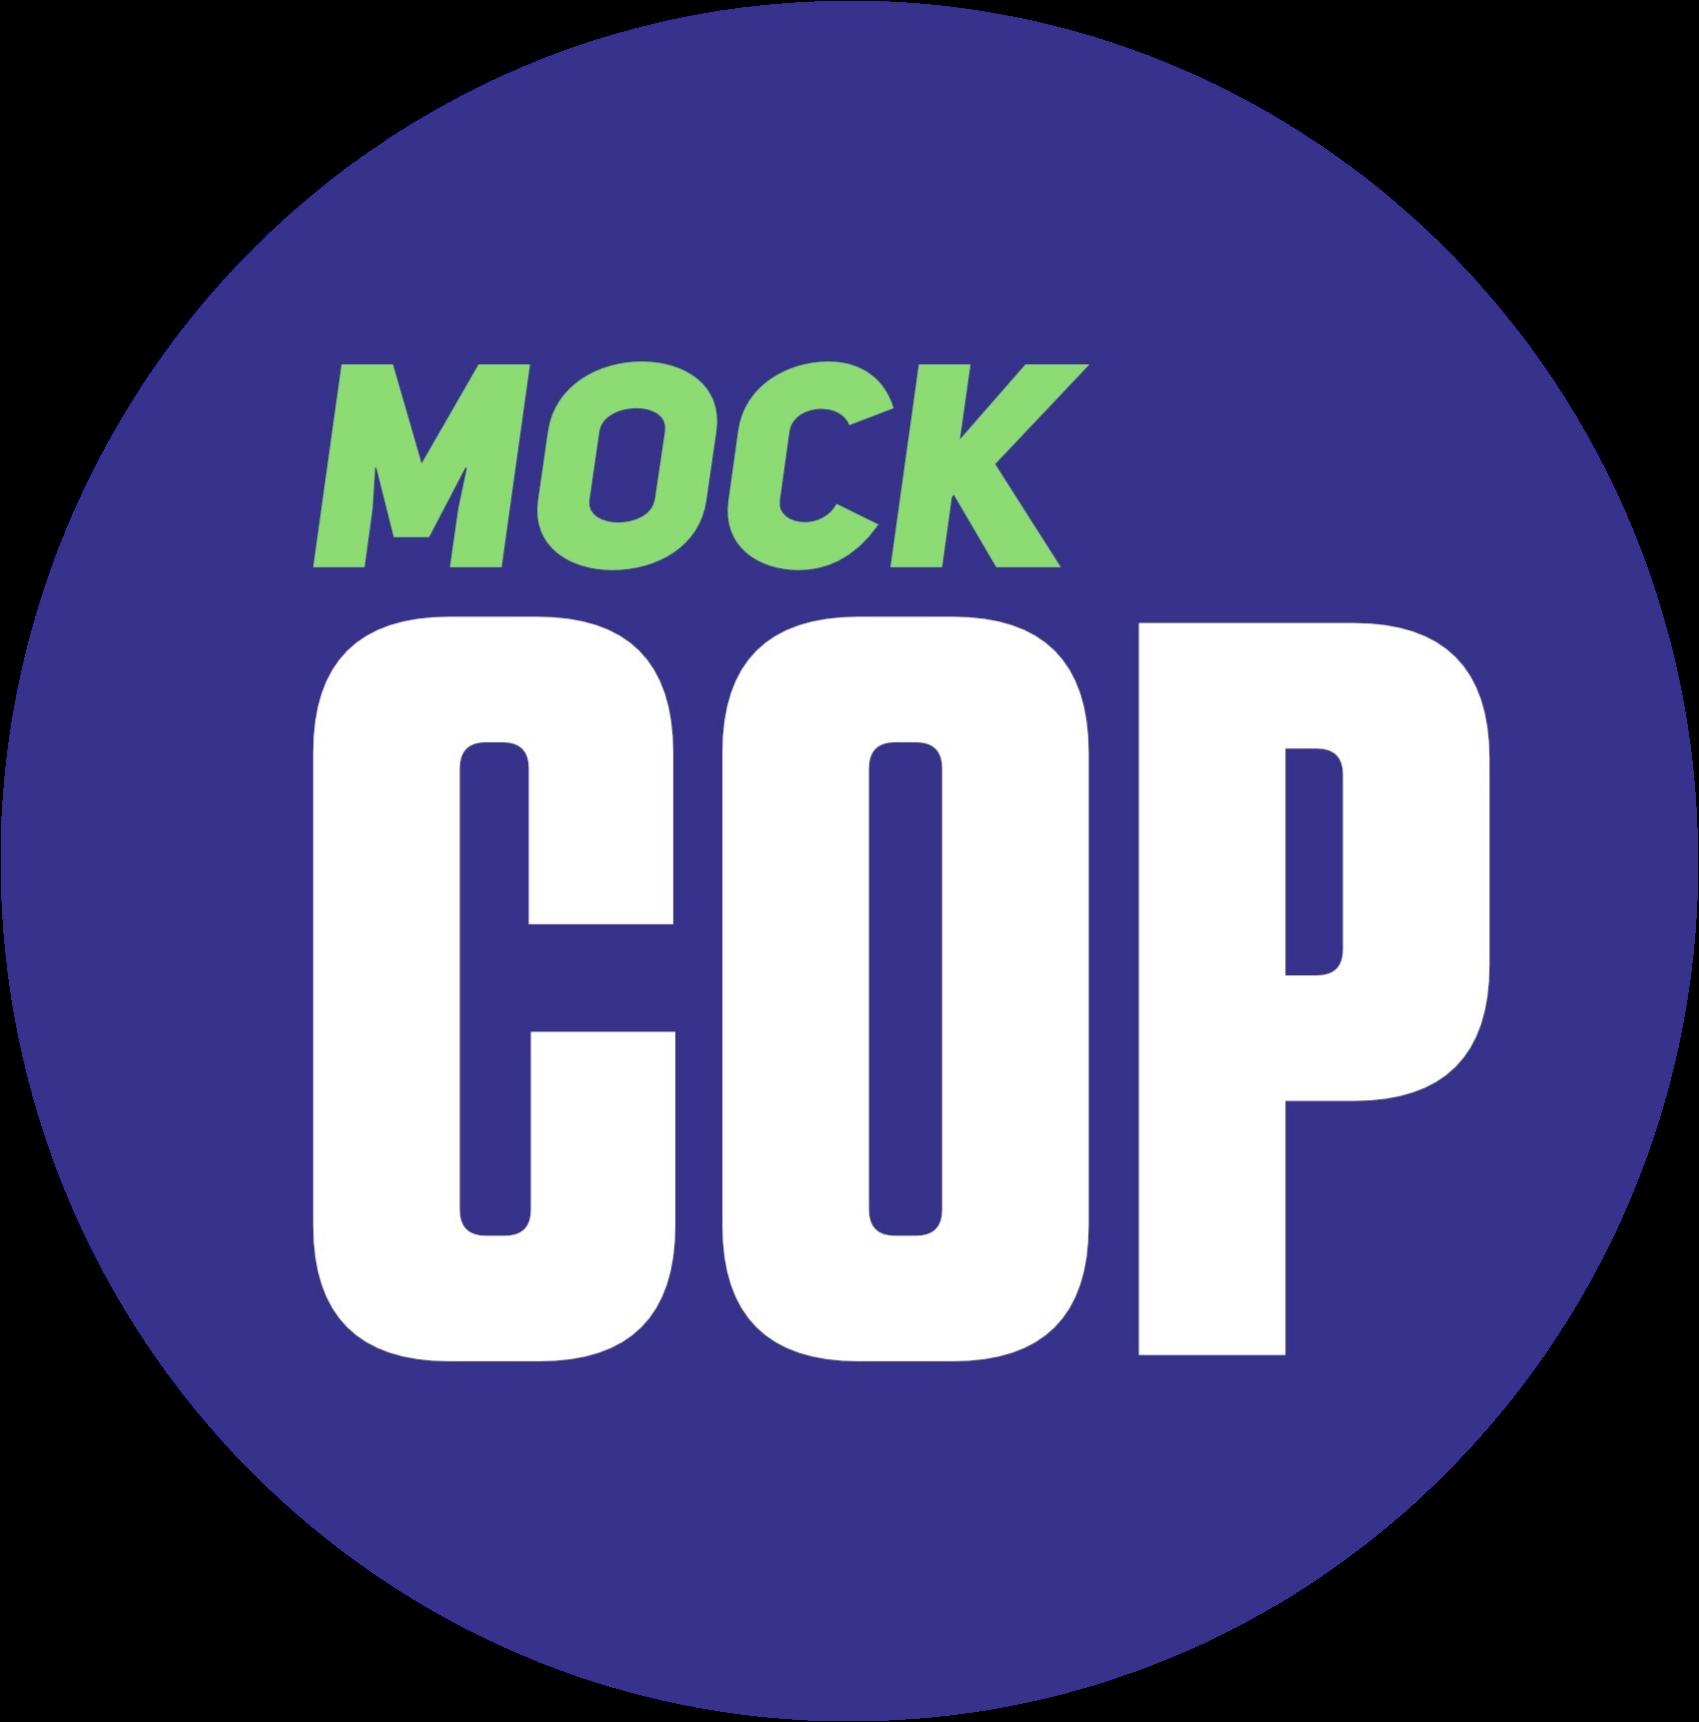 Mock COP Logo